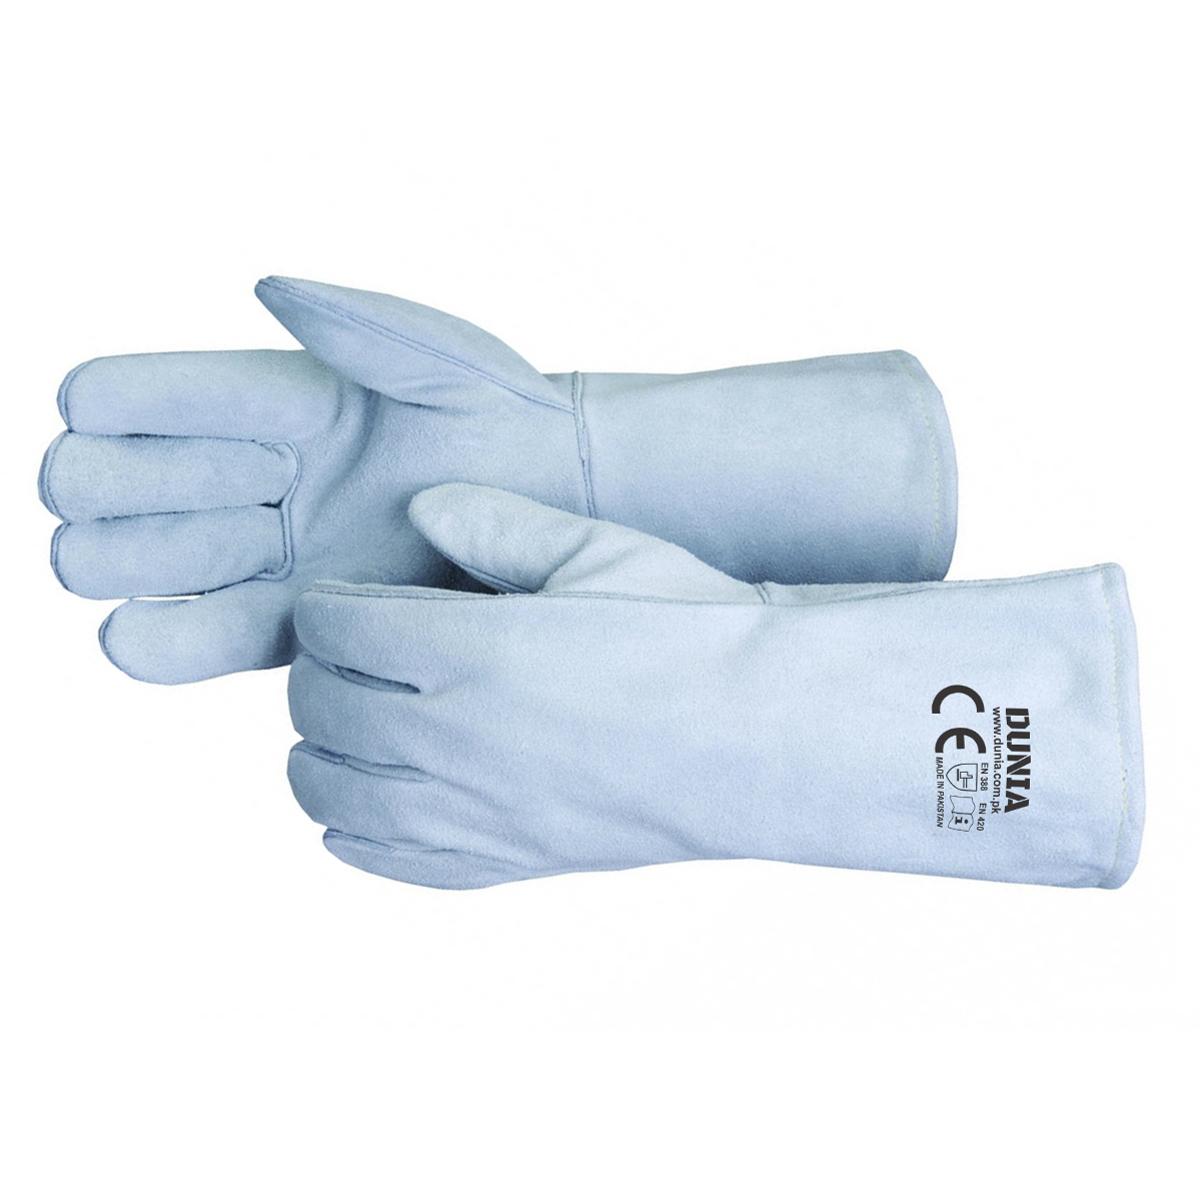 DTC-723 Grey Welders Gloves